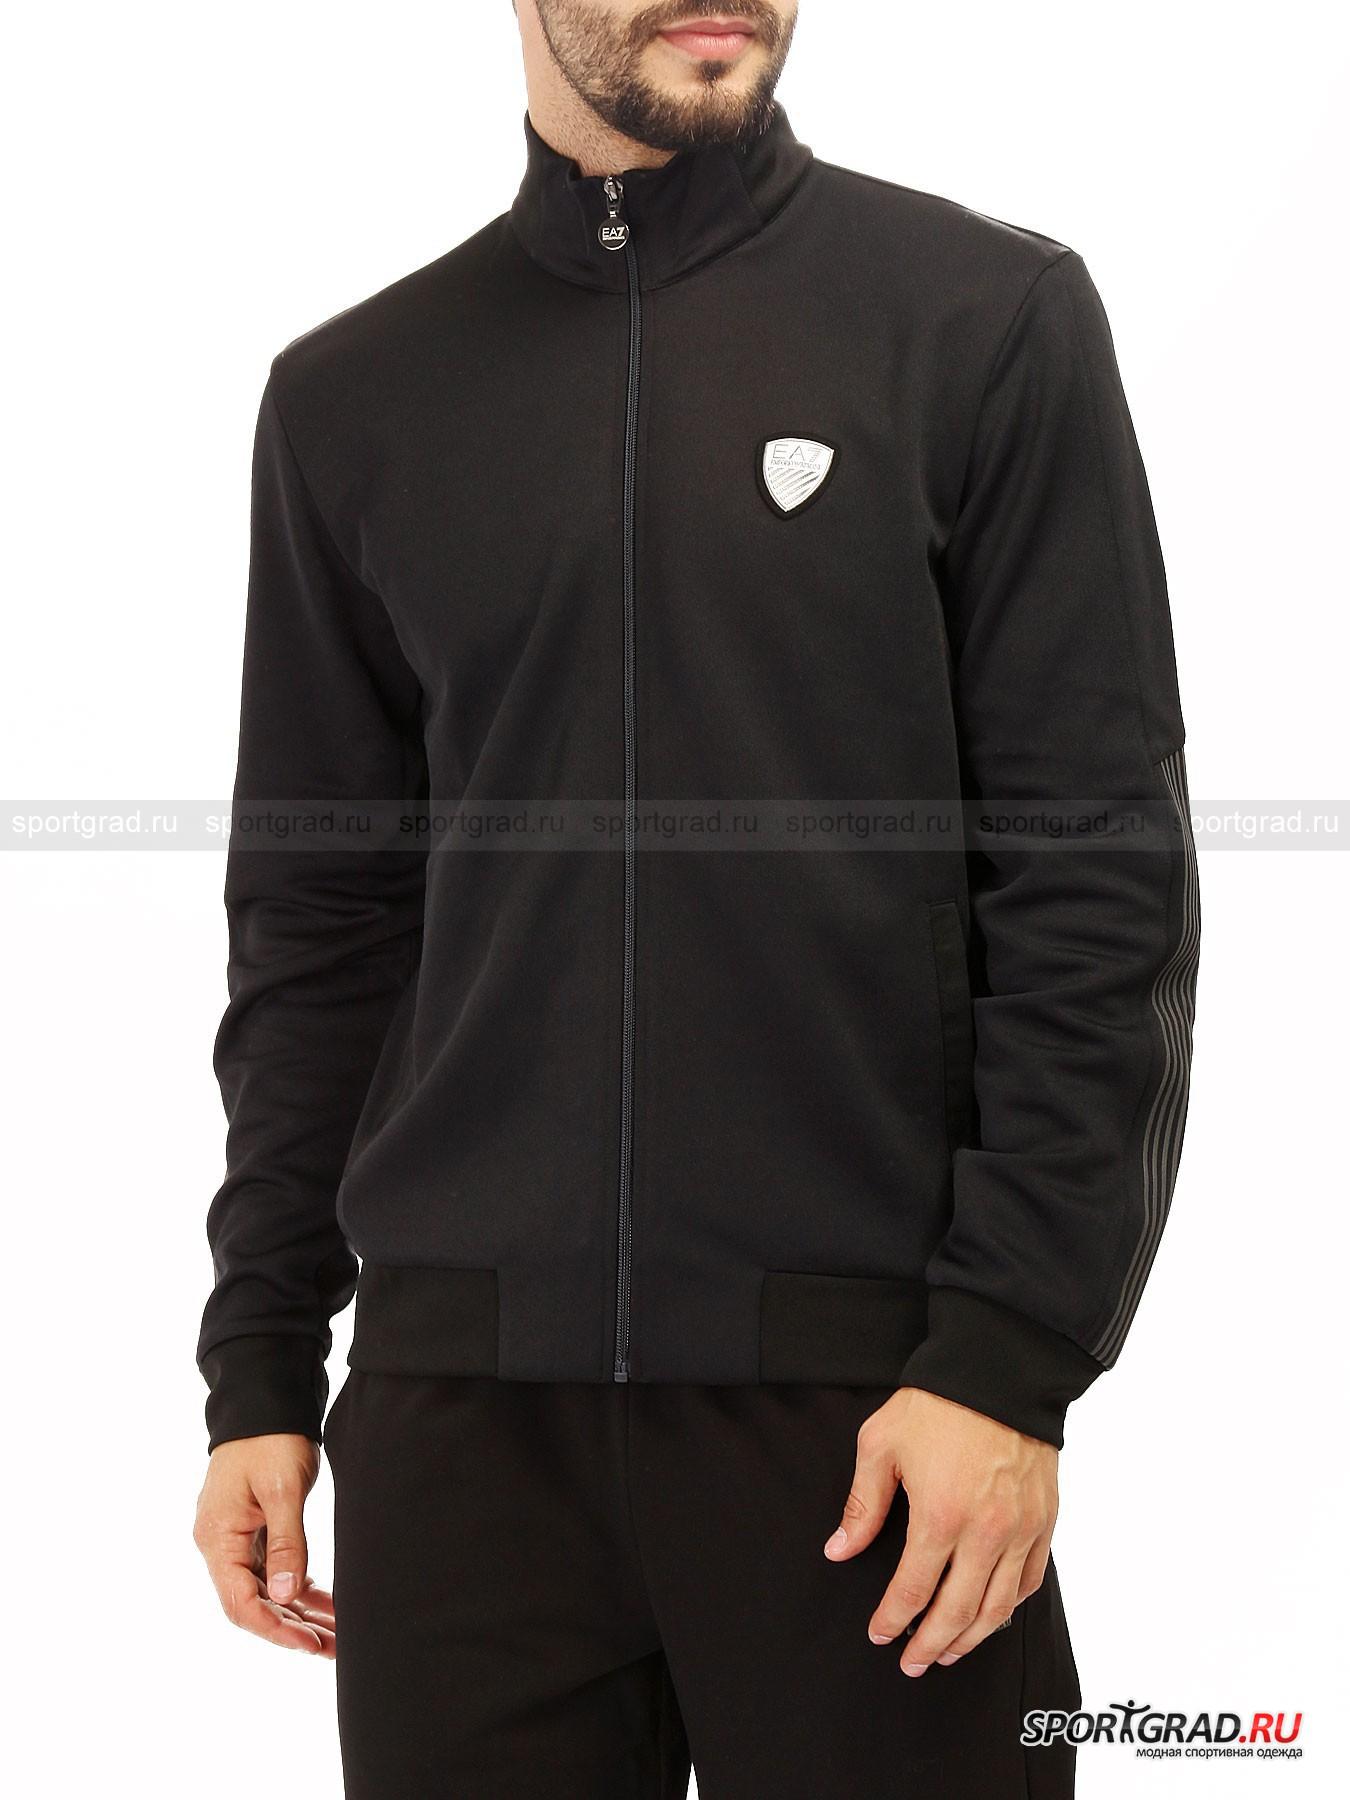 ��������� ������� Train Soccer Sweatshirt EMPORIO ARMANI